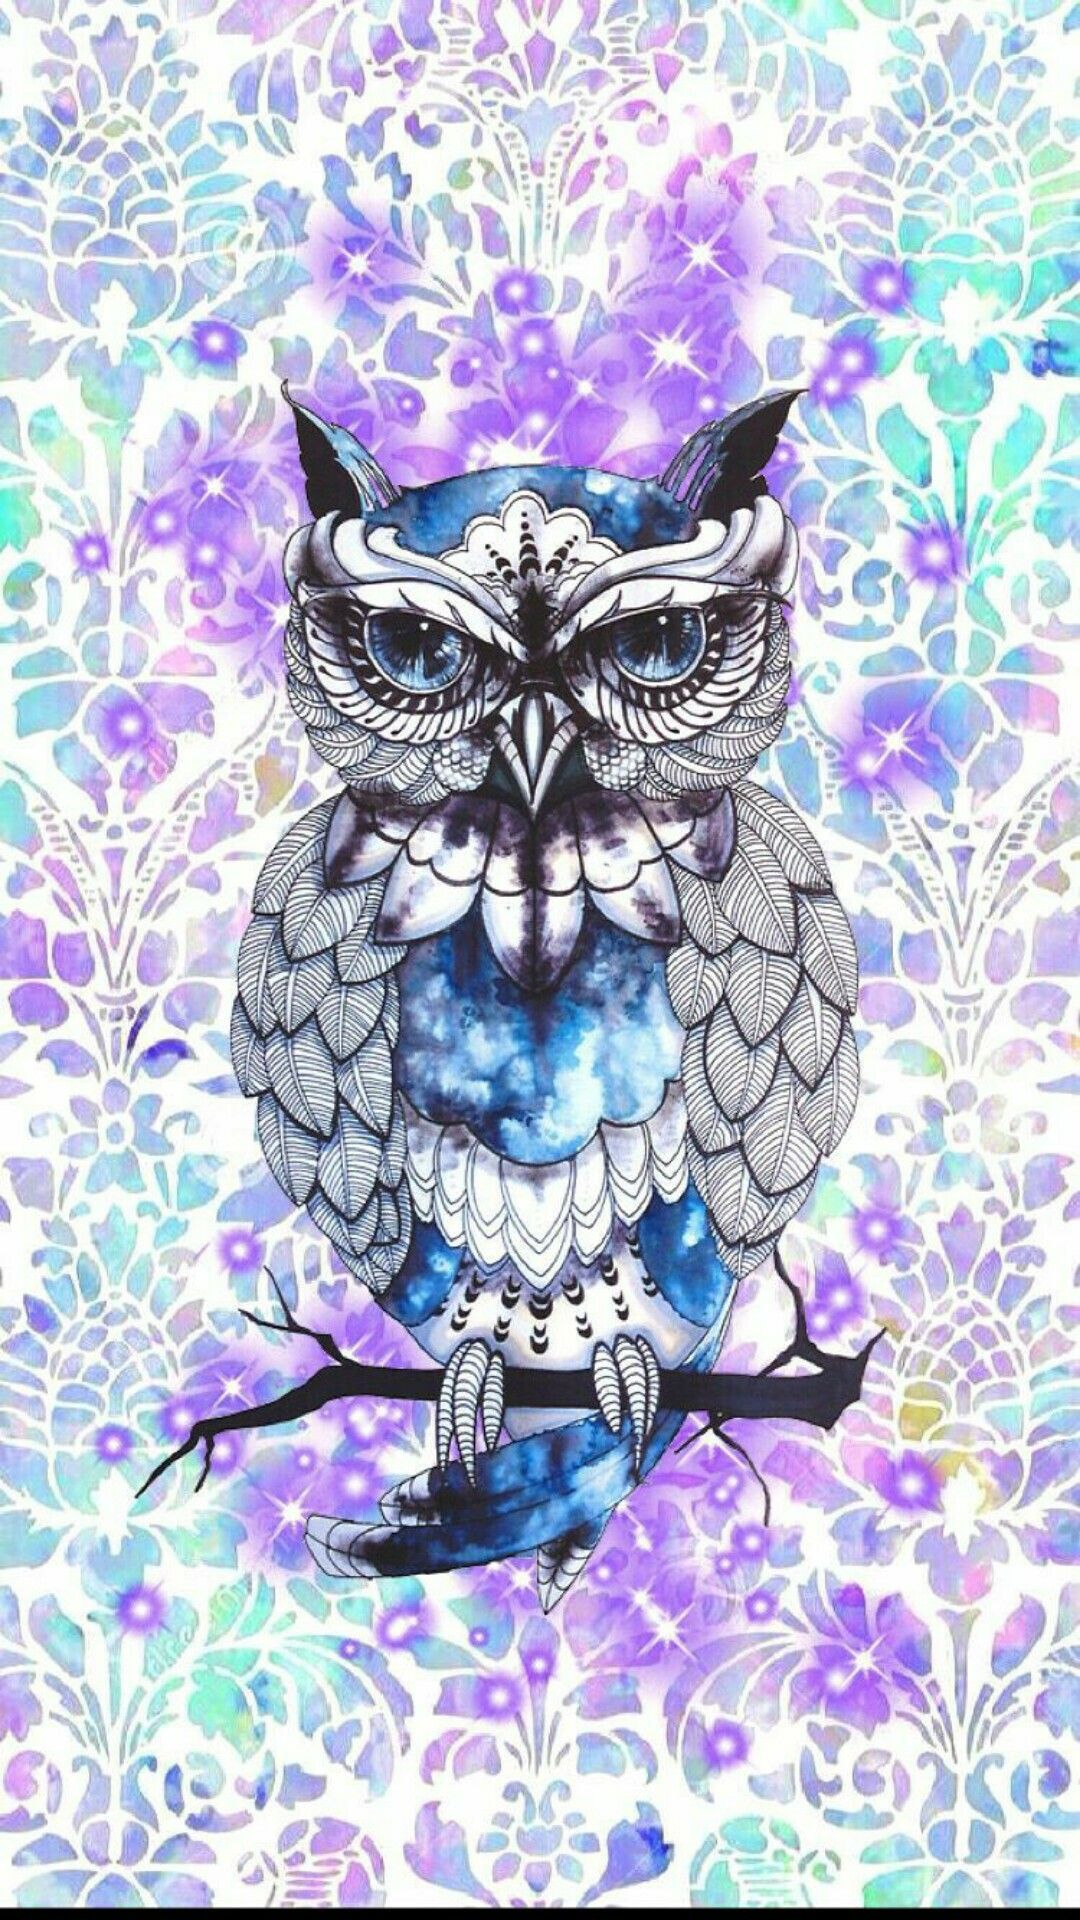 Cute Owl Wallpaper Mobile Cute Owls Wallpaper Owl Wallpaper Animal Wallpaper